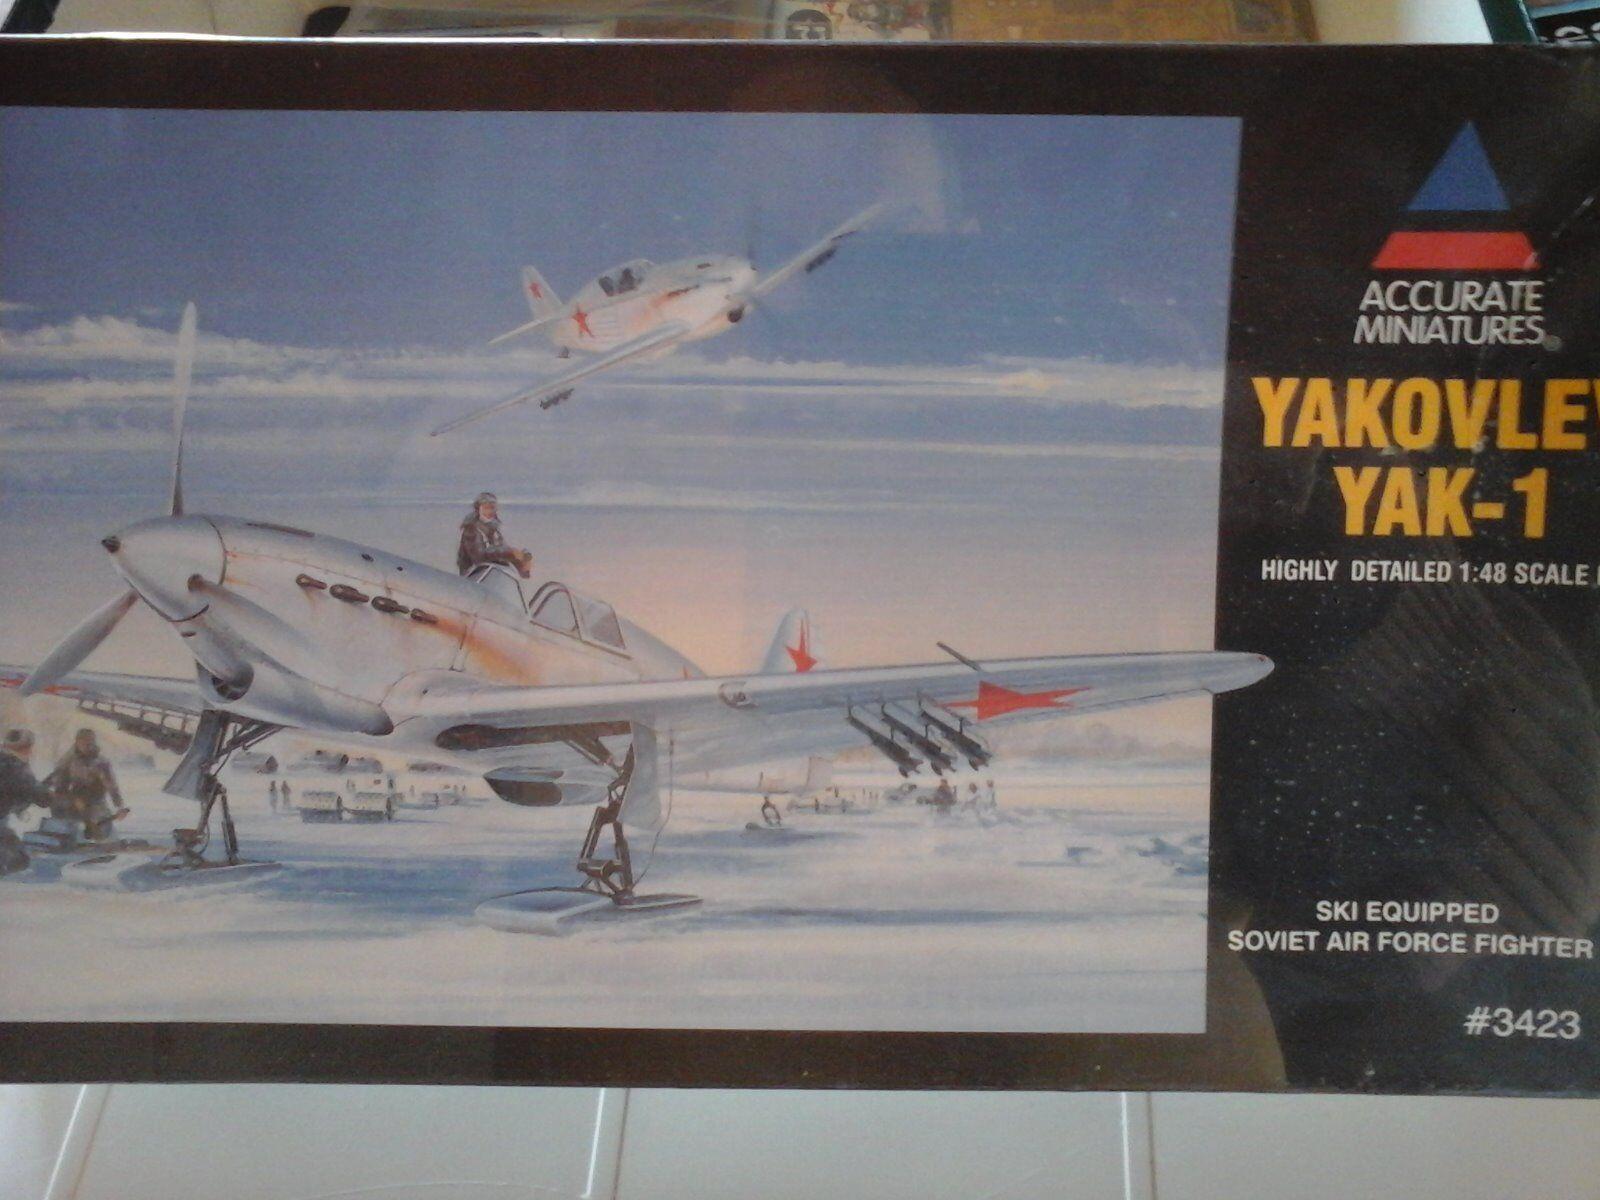 YAKOLEV YAKOLEV YAKOLEV YAK1 FIGHTER 1/48 SCALE ACCURATE MINIATURES MODEL 95dc76